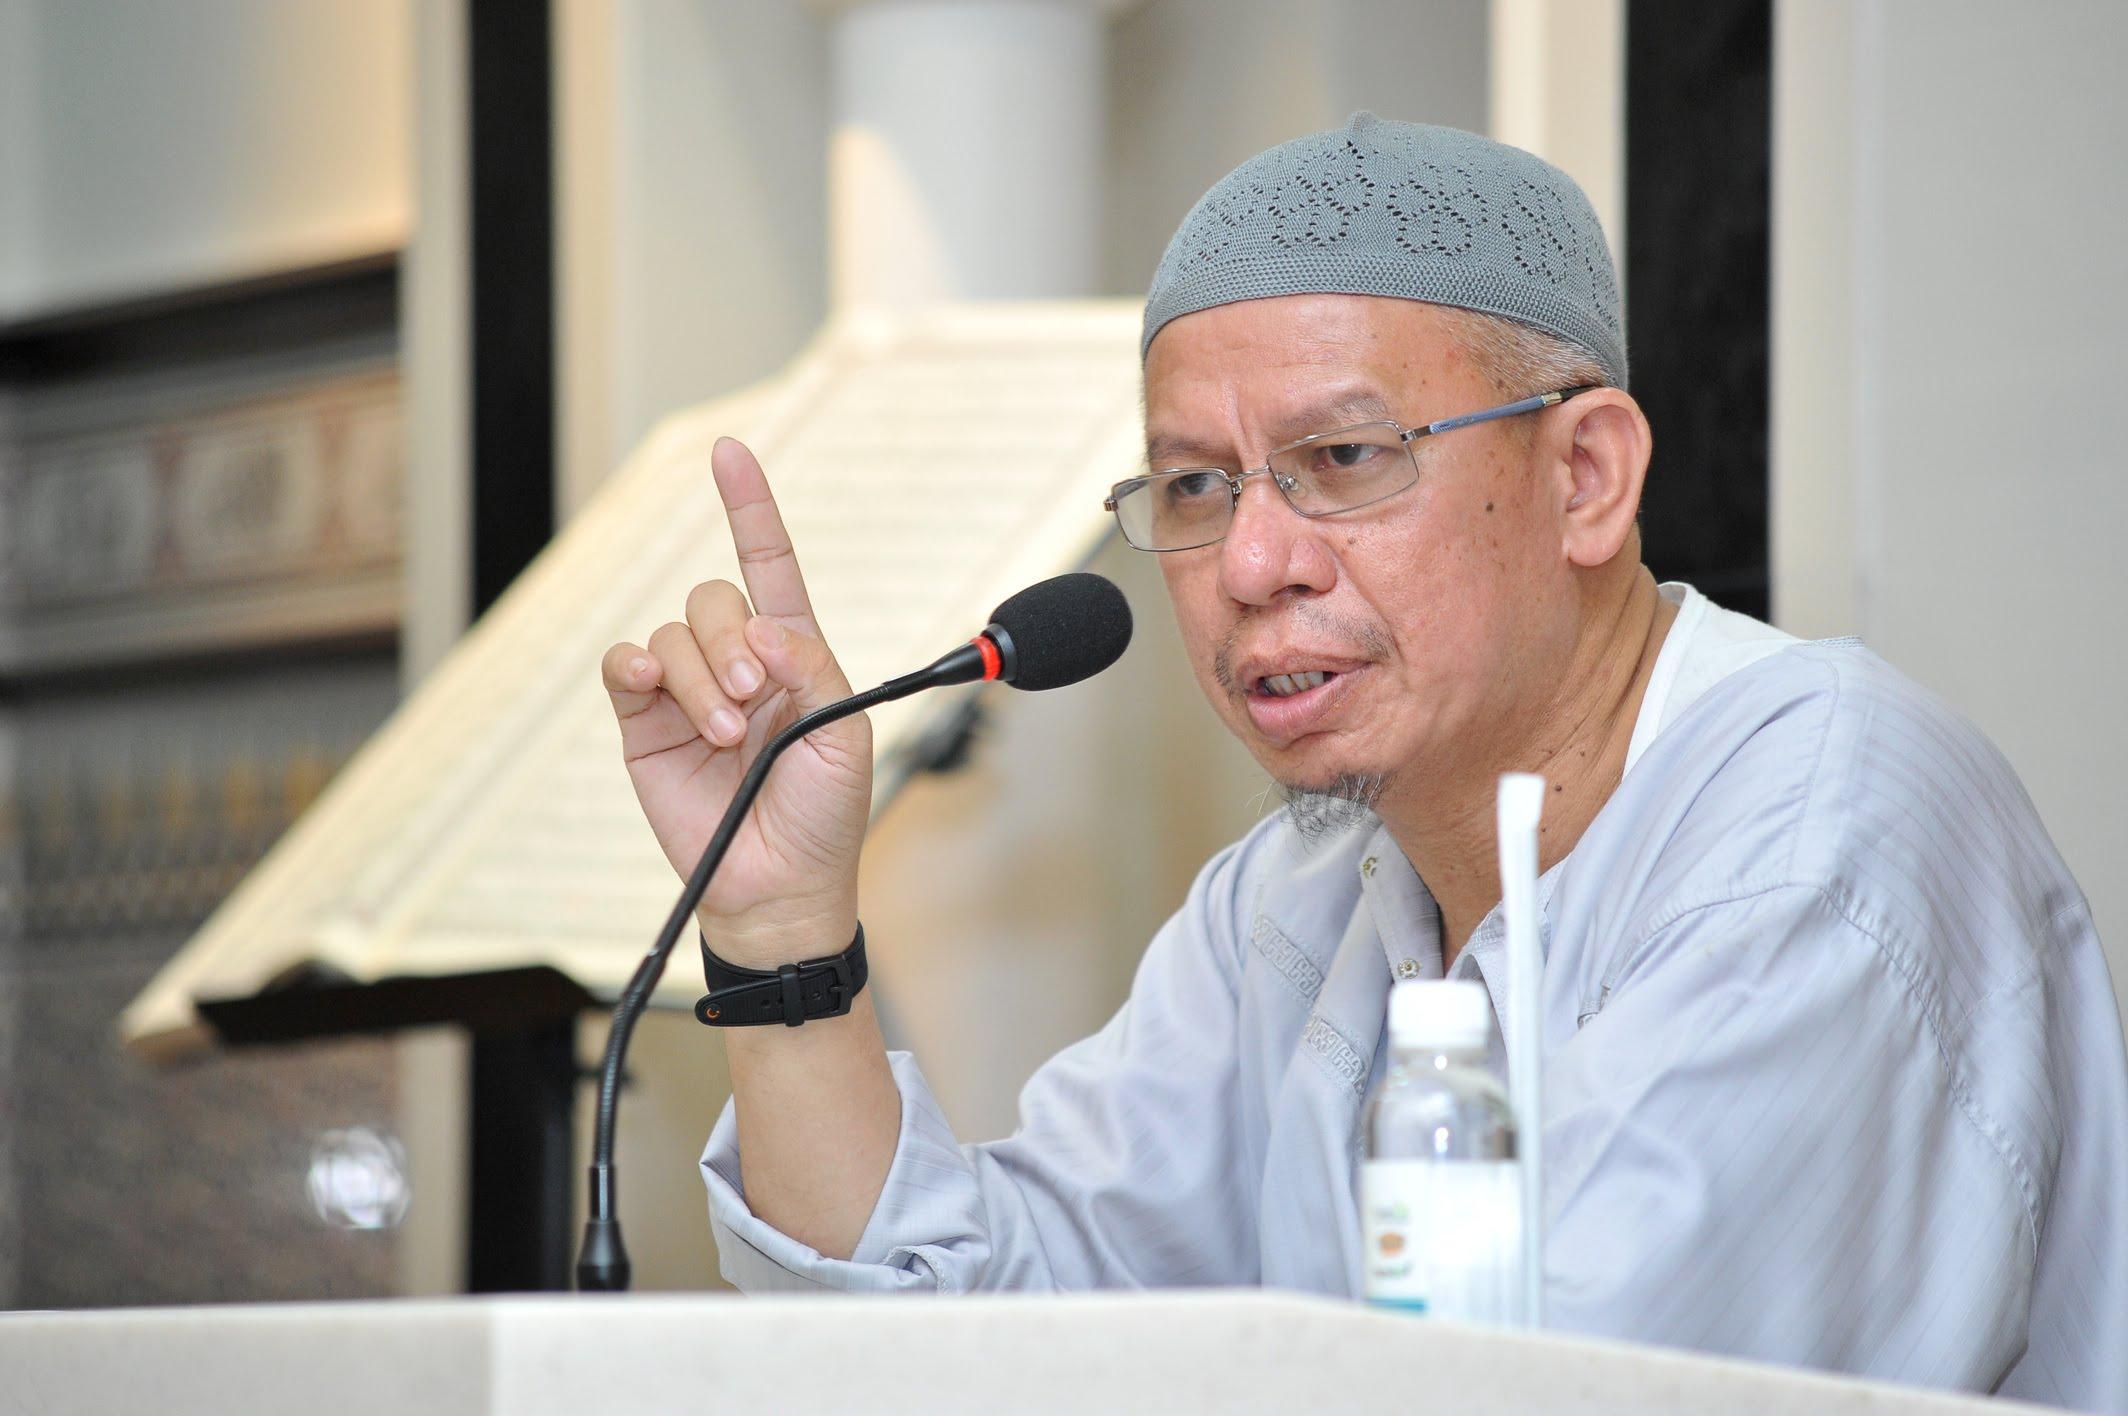 Mufti Wilayah Persekutuan, Datuk Dr. Zulkifli Mohamad Al-Bakri.